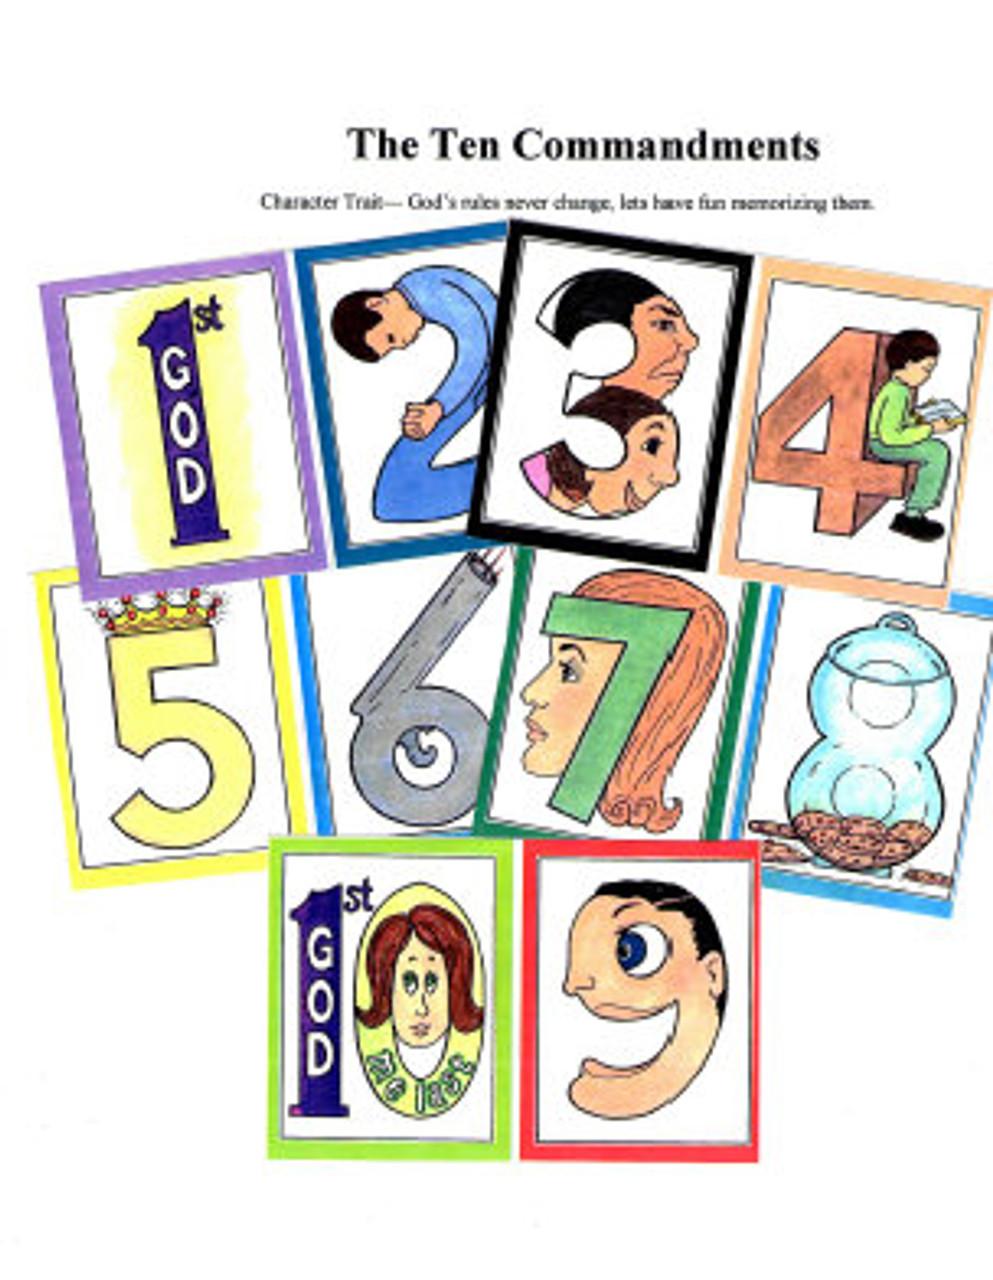 The Ten Commandments (object story)